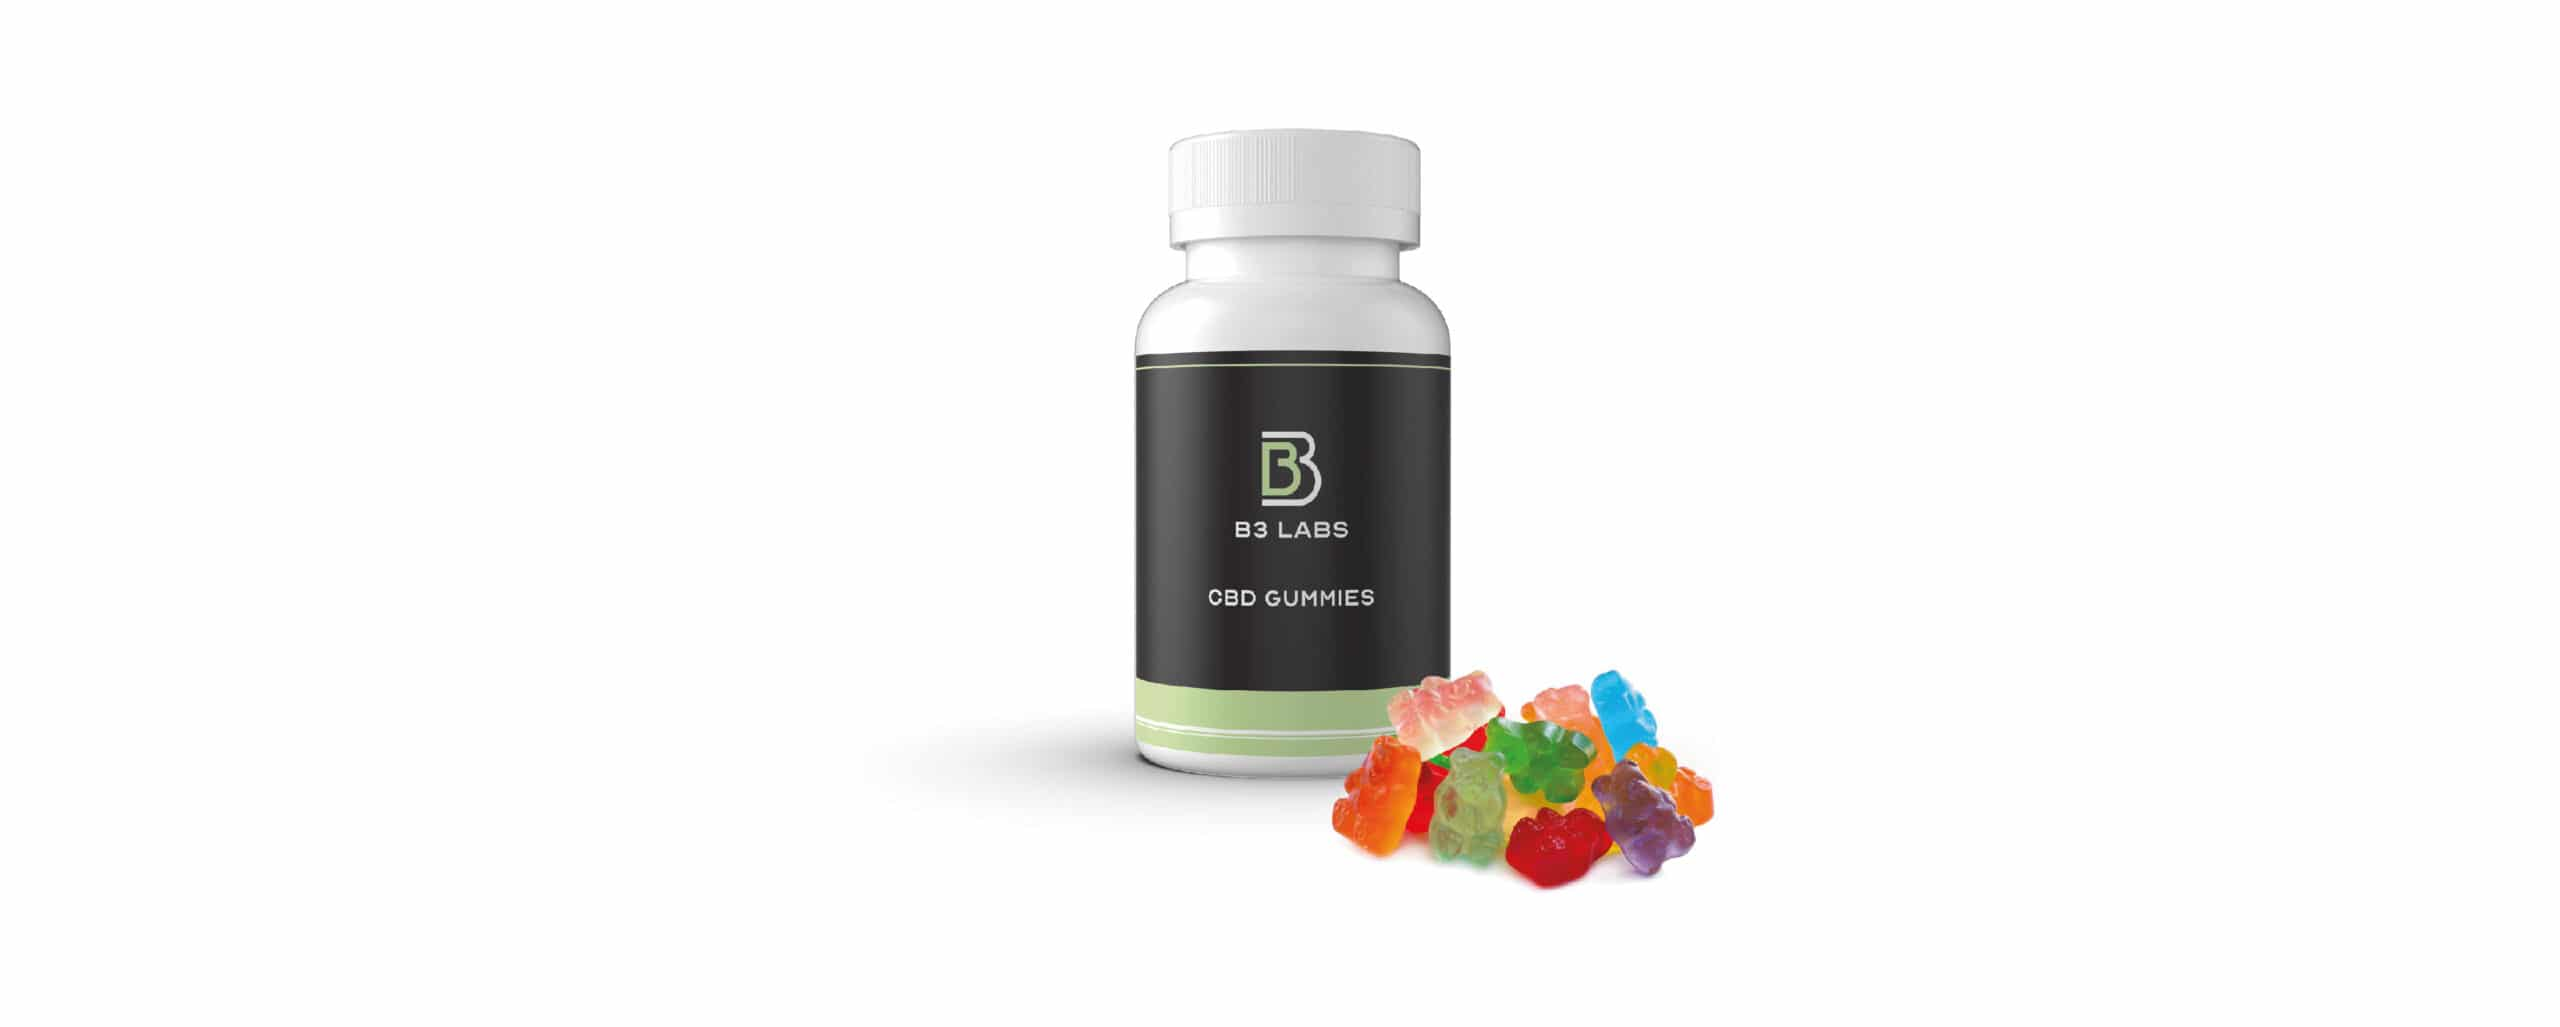 CBD Gummies Product From B3 Labs